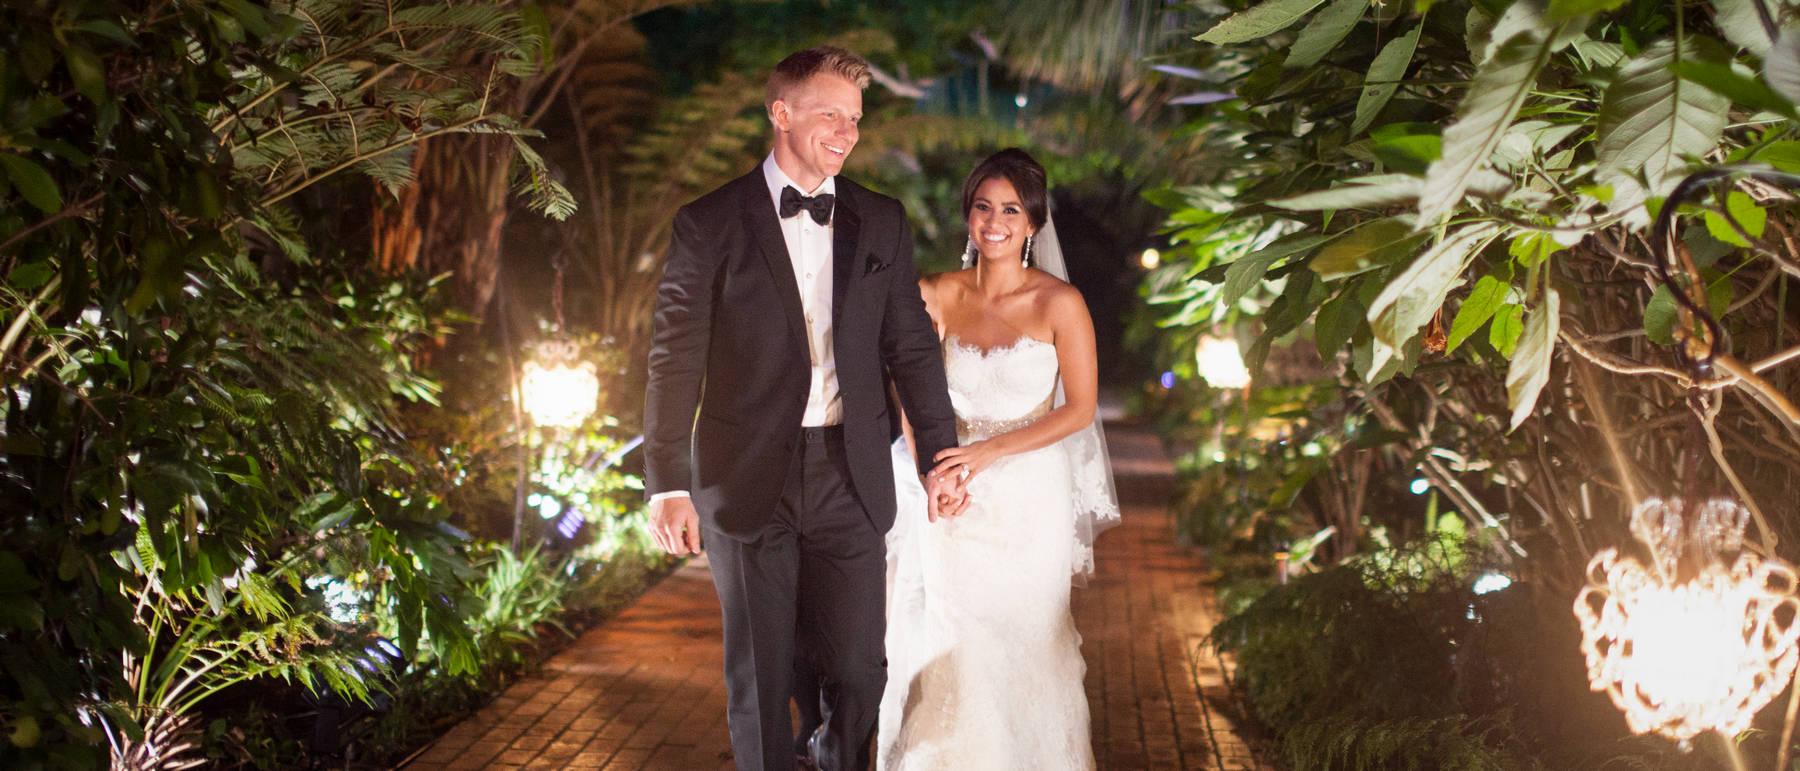 johnandjoseph-wedding-photographer-hz-slider-371